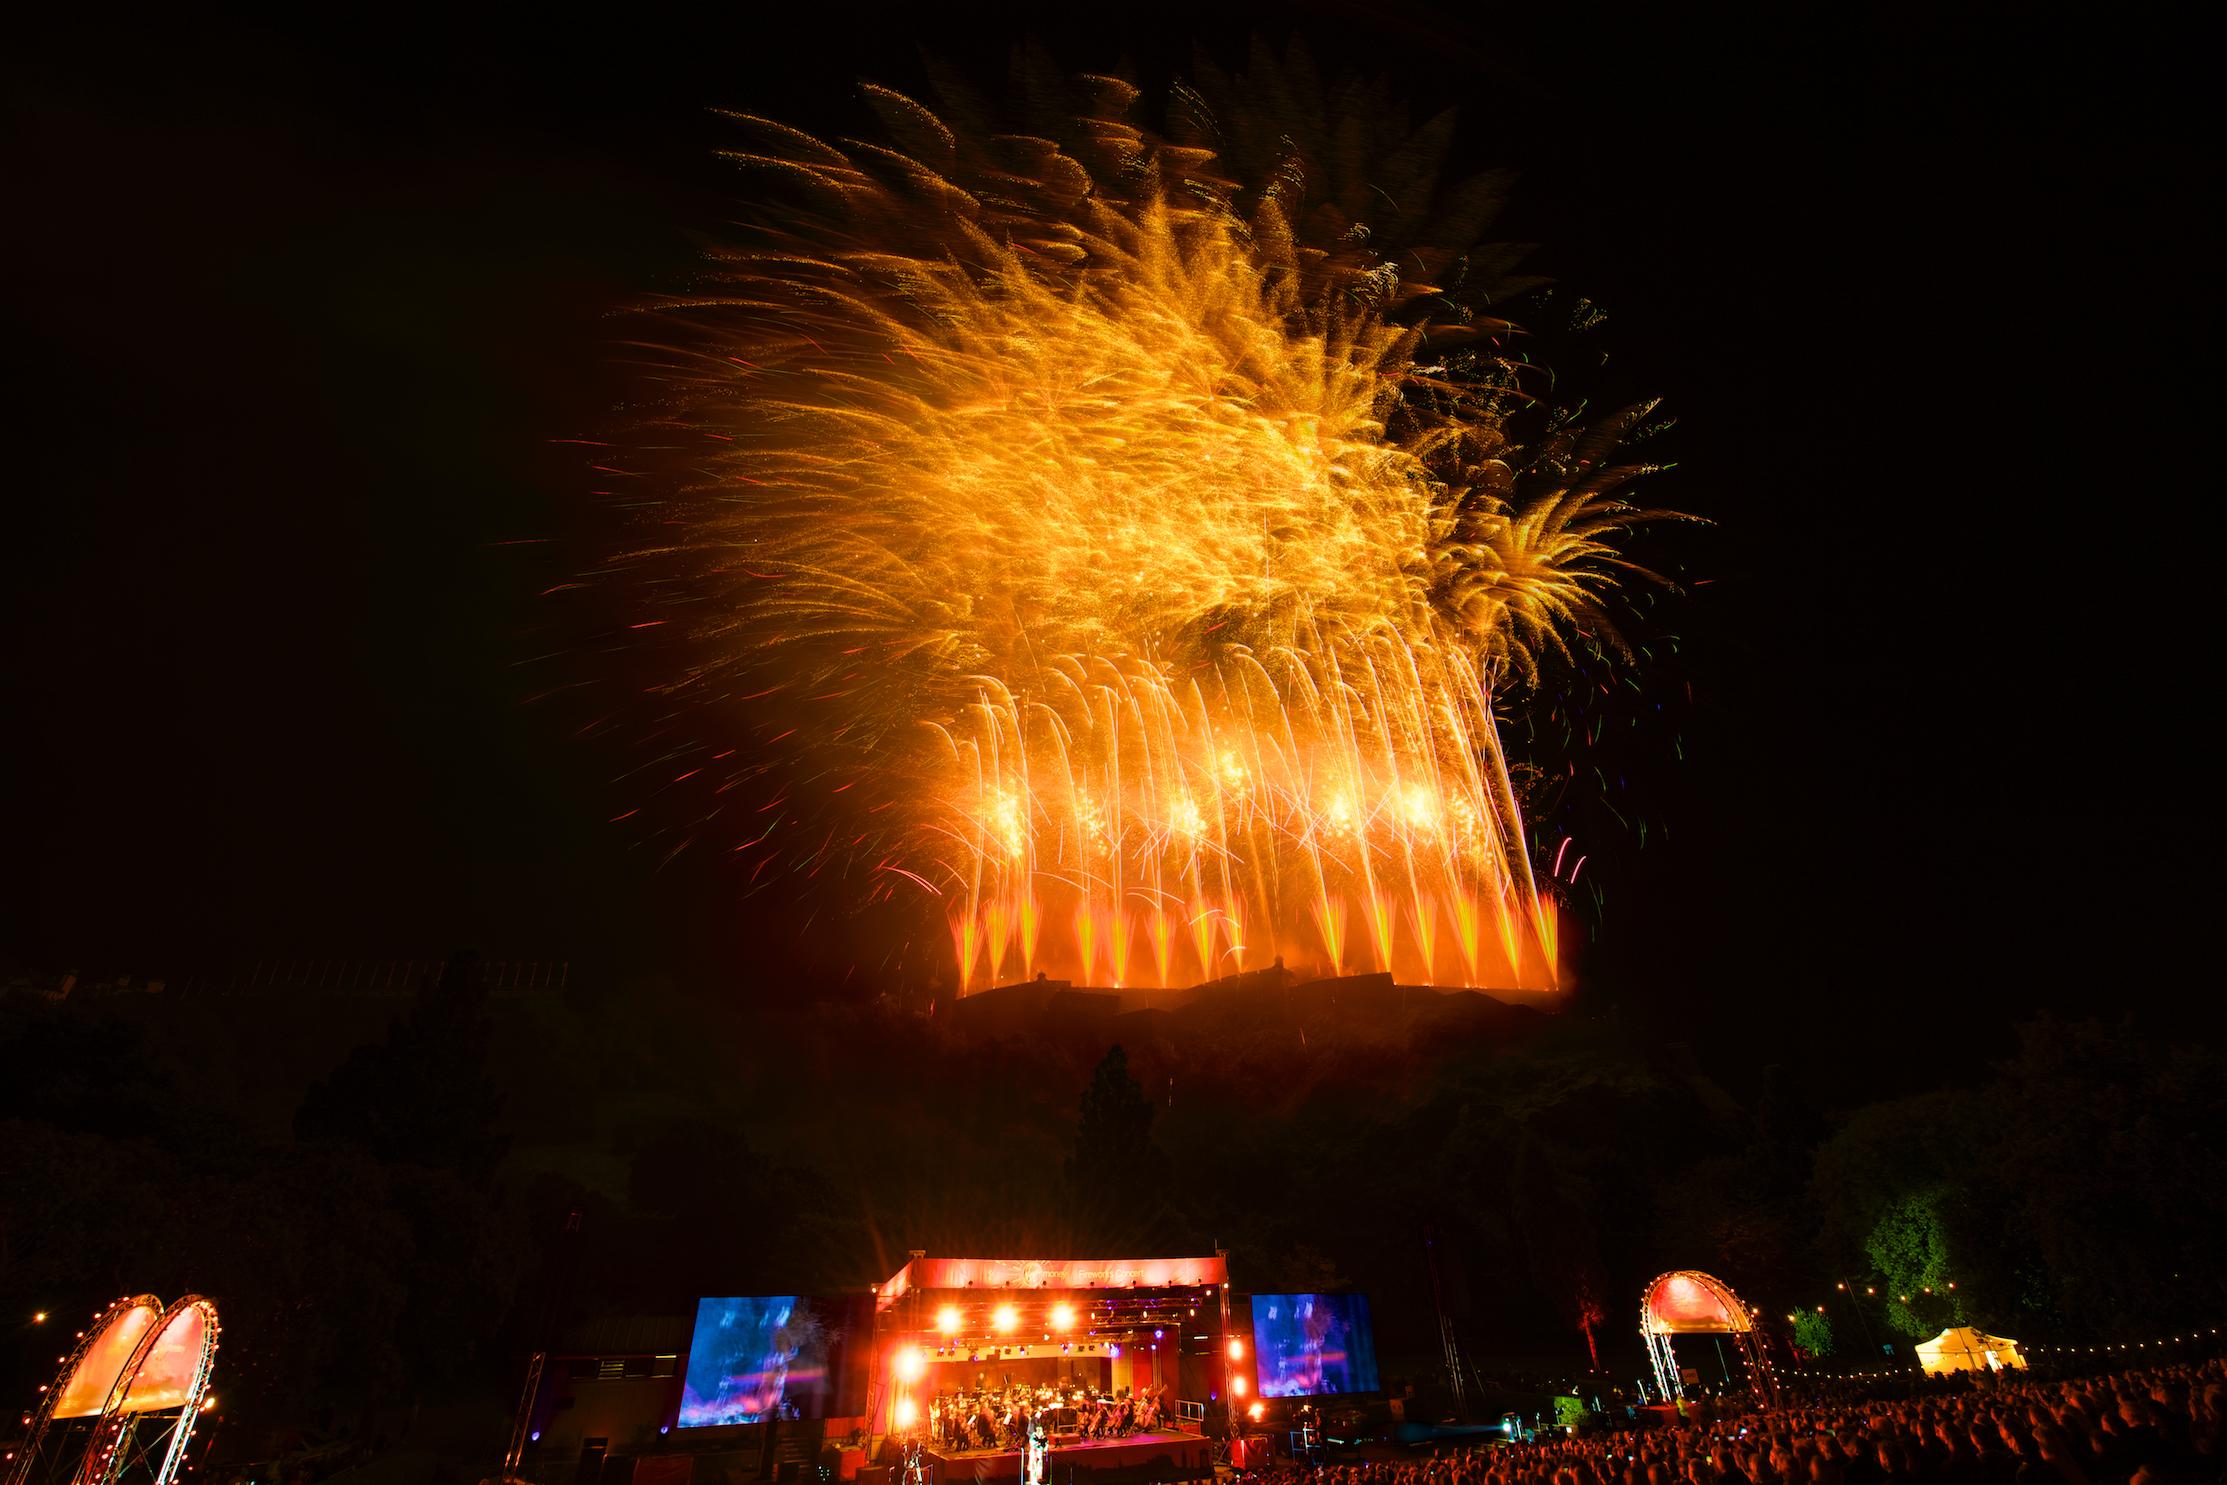 grand-finale-of-the-2017-international-festival-virgin-money-fireworks-concert-ross-bandstand-princes-street-gardens-edinburgh-uk-monday-28th-august-2017-16